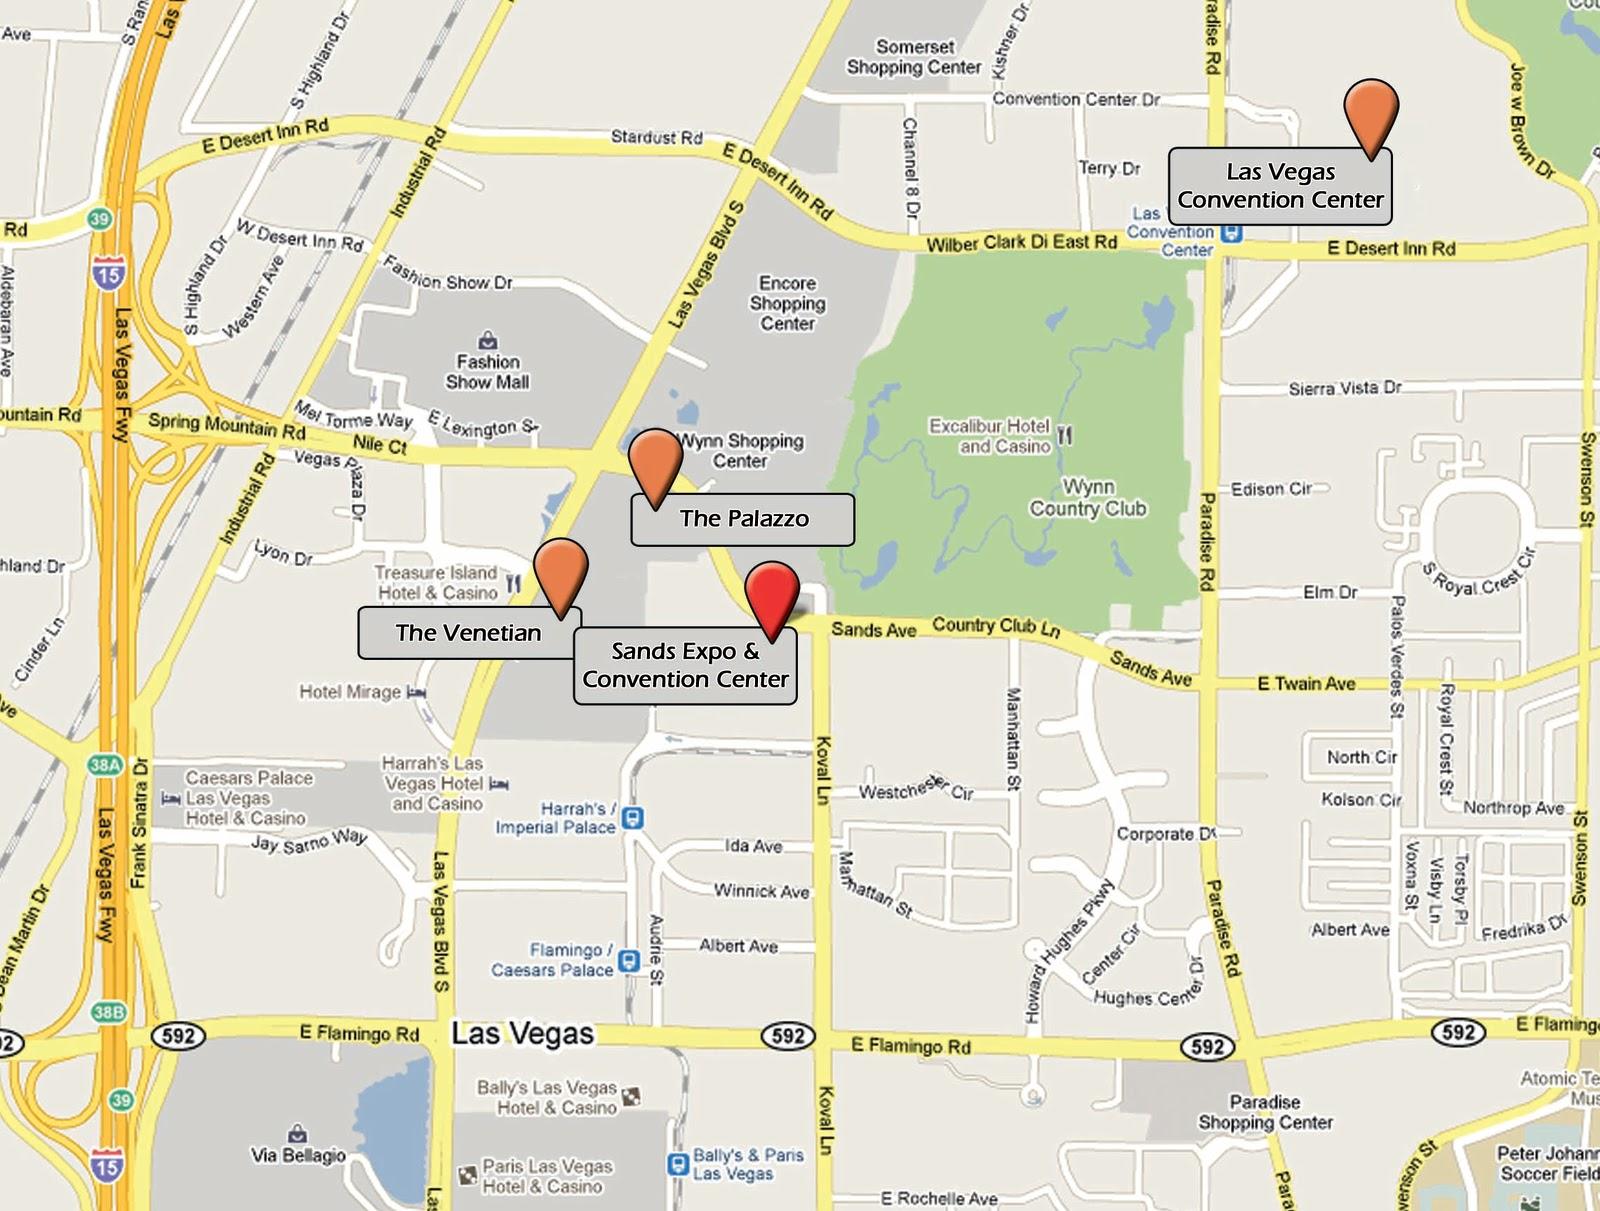 Las Vegas Convention Center Map Of Halls